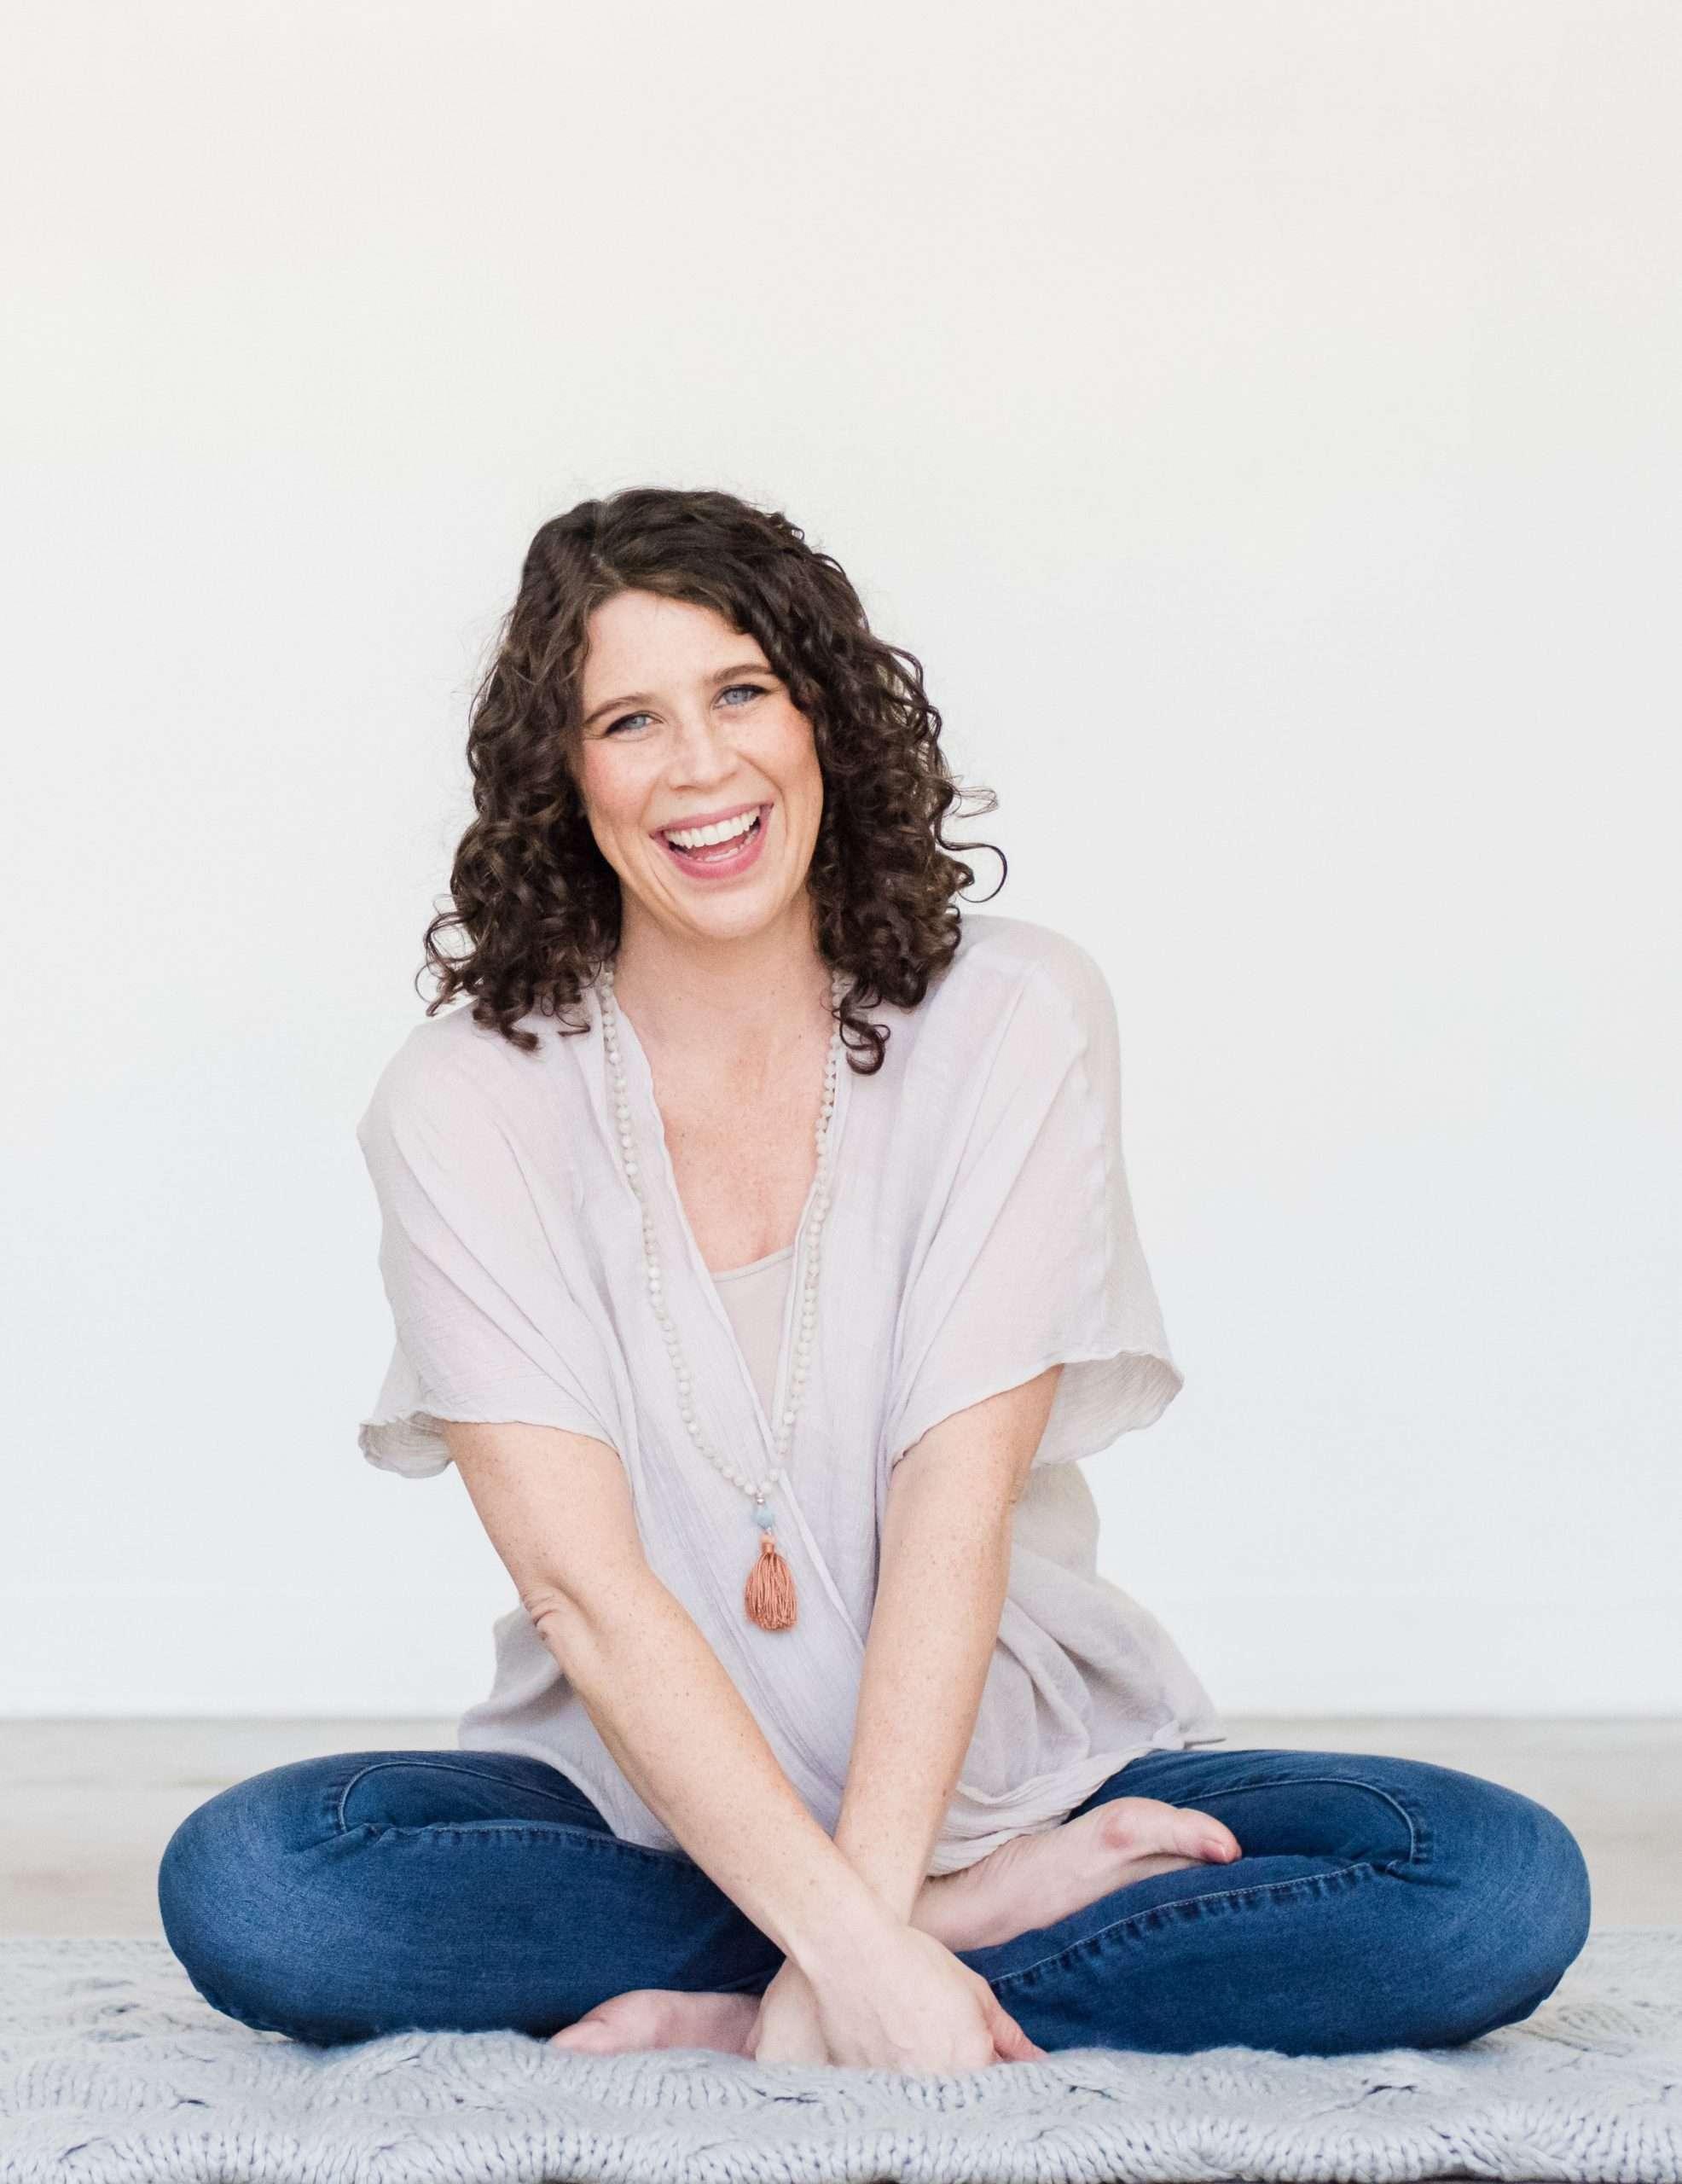 Katie Acupuncture business coach